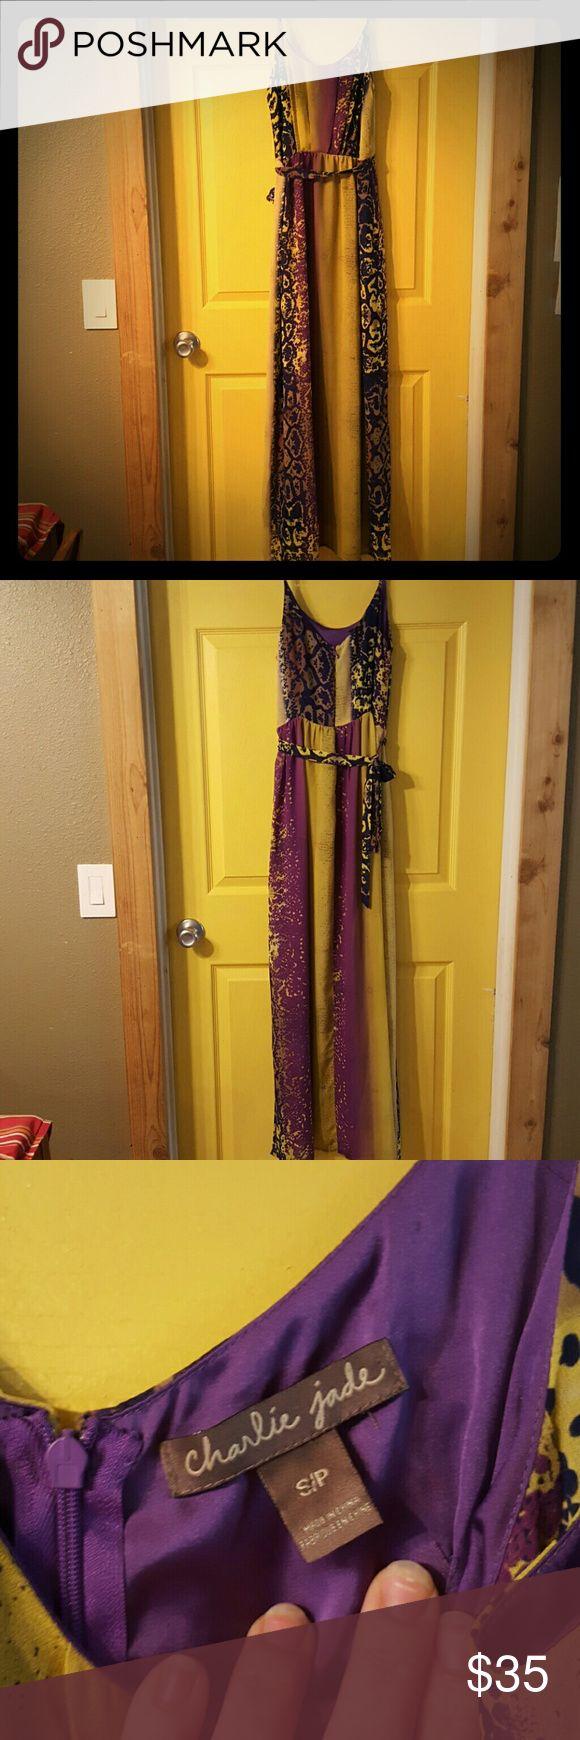 Gorgeous Charlie Jade silky dress Spaghetti straps, double slit, tied maxi/evening dress. Purple, blue and deep yellow python print. Charlie jade Dresses Maxi